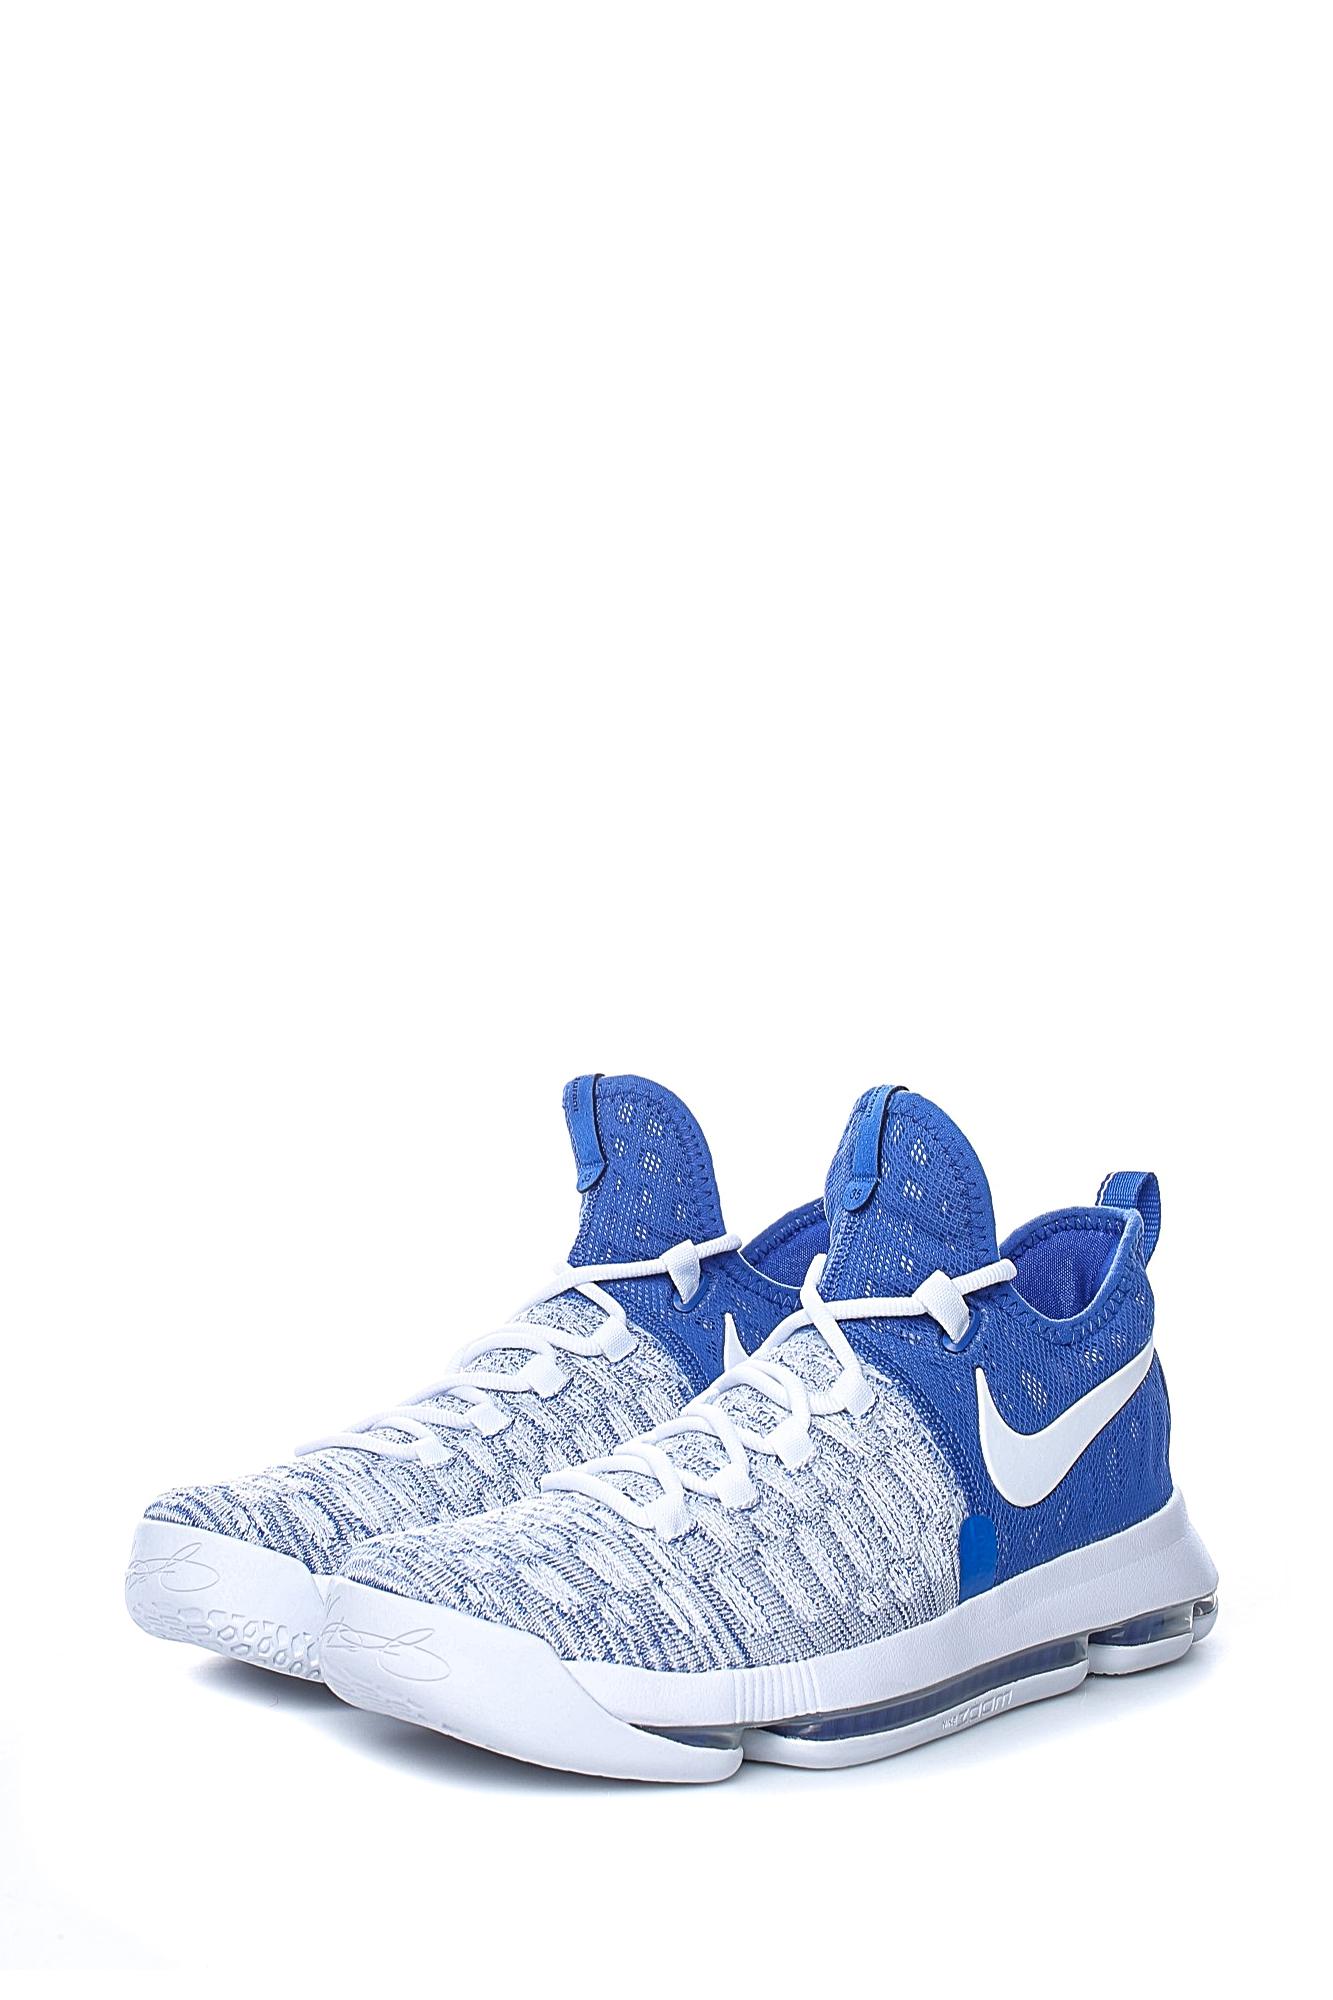 eb50fc9806e NIKE - Ανδρικά παπούτσια για μπάσκετ Nike ZOOM KD 9 μπλε - λευκά, Ανδρικά  παπούτσια μπάσκετ, ΑΝΔΡΑΣ   ΠΑΠΟΥΤΣΙΑ   ΜΠΑΣΚΕΤ